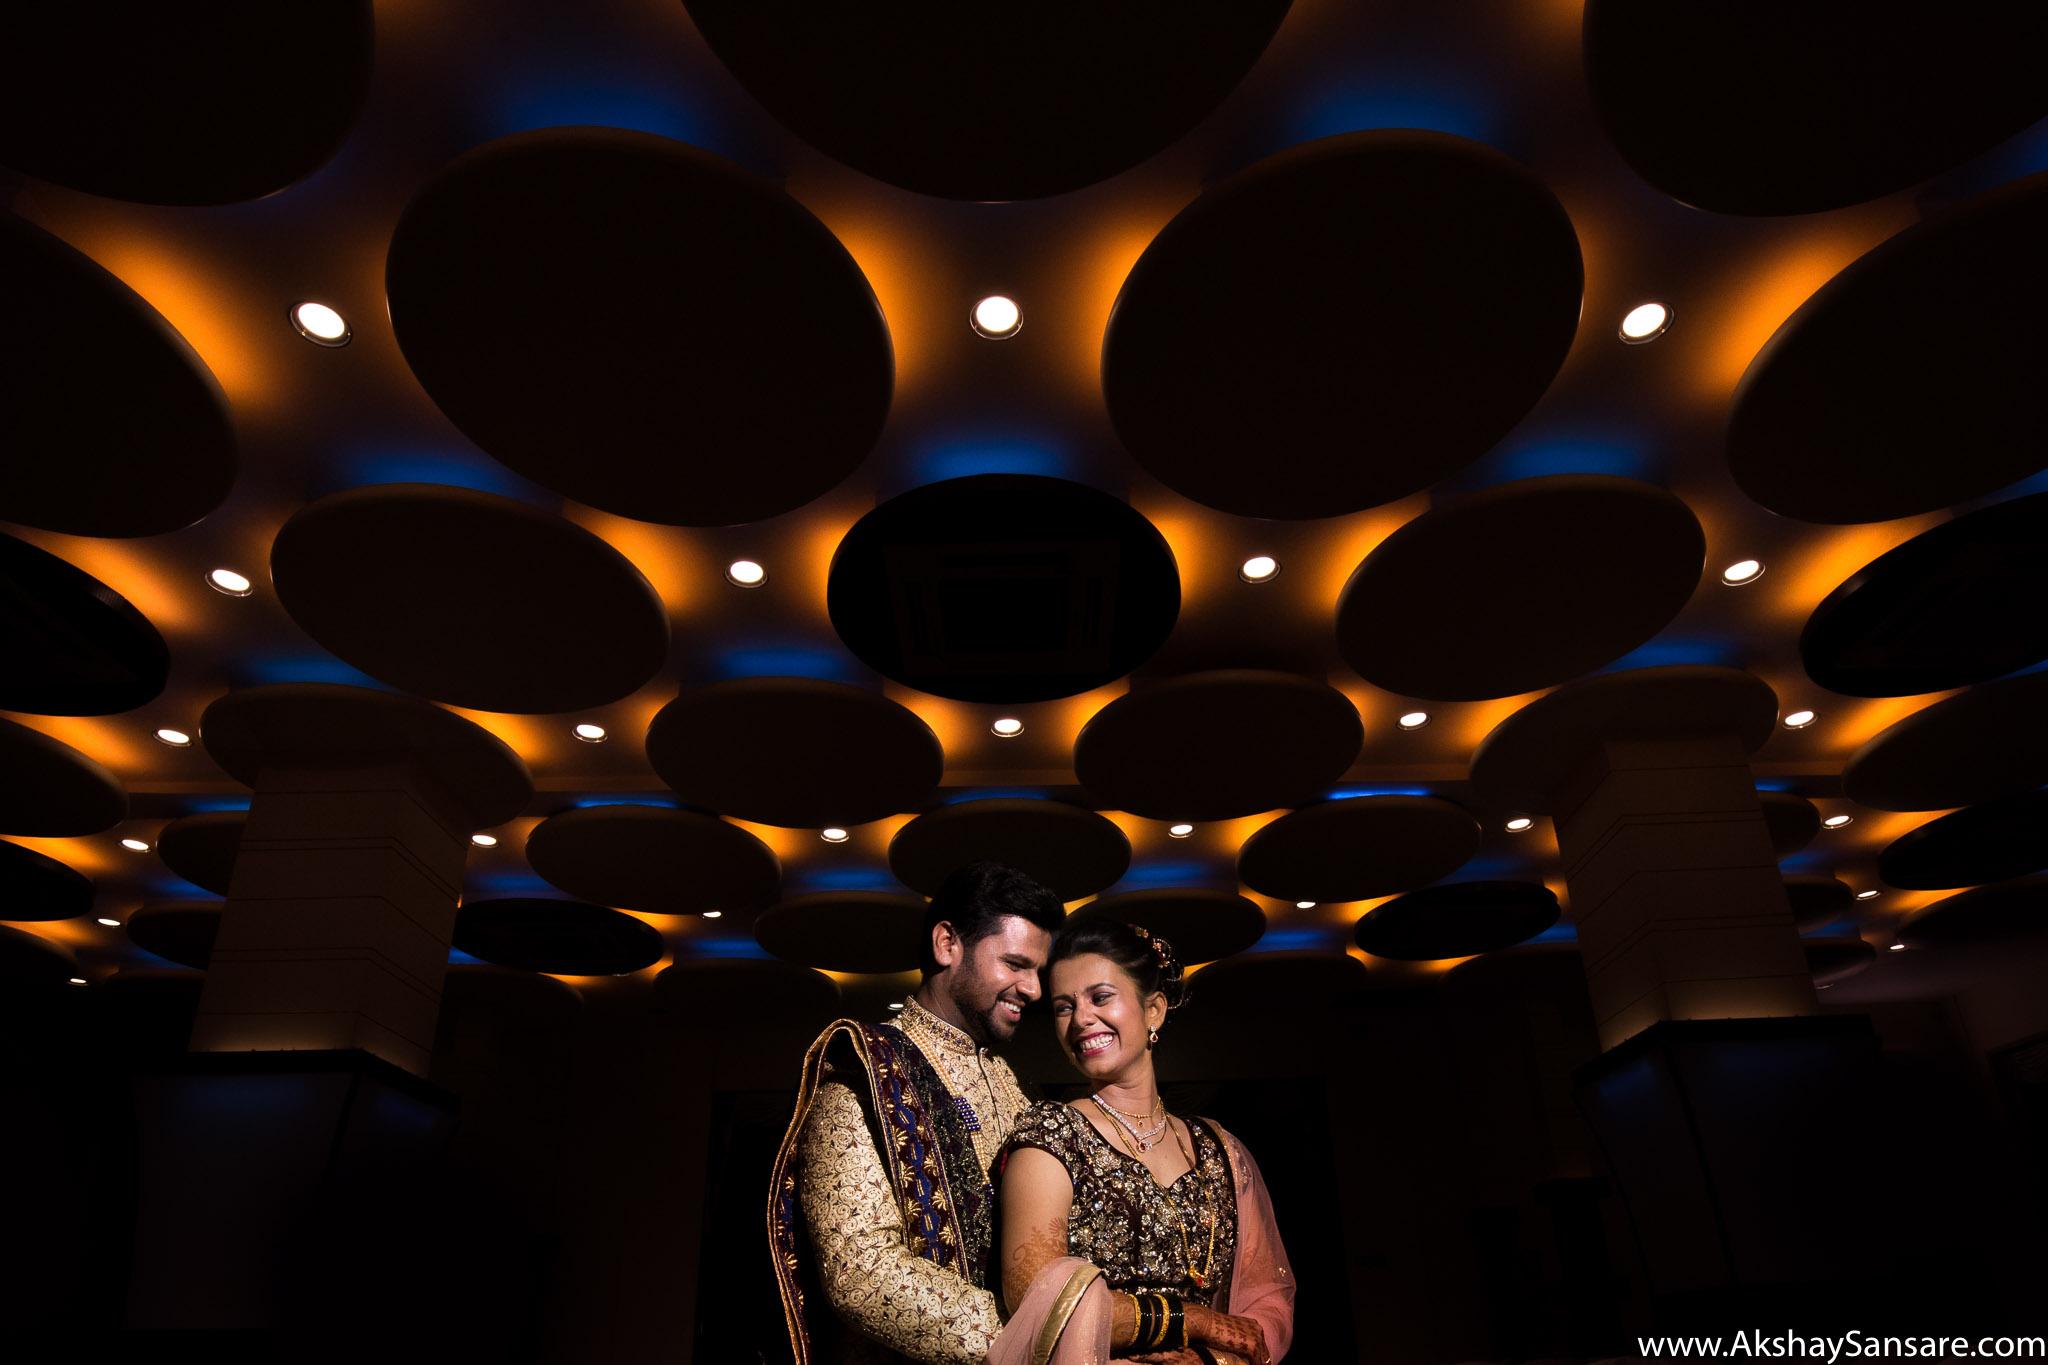 Aditya x Poonam Blog Akshay Sansare Photography Candid Photographer in Mumbai Best Cinematic wedding film filmer-26.jpg